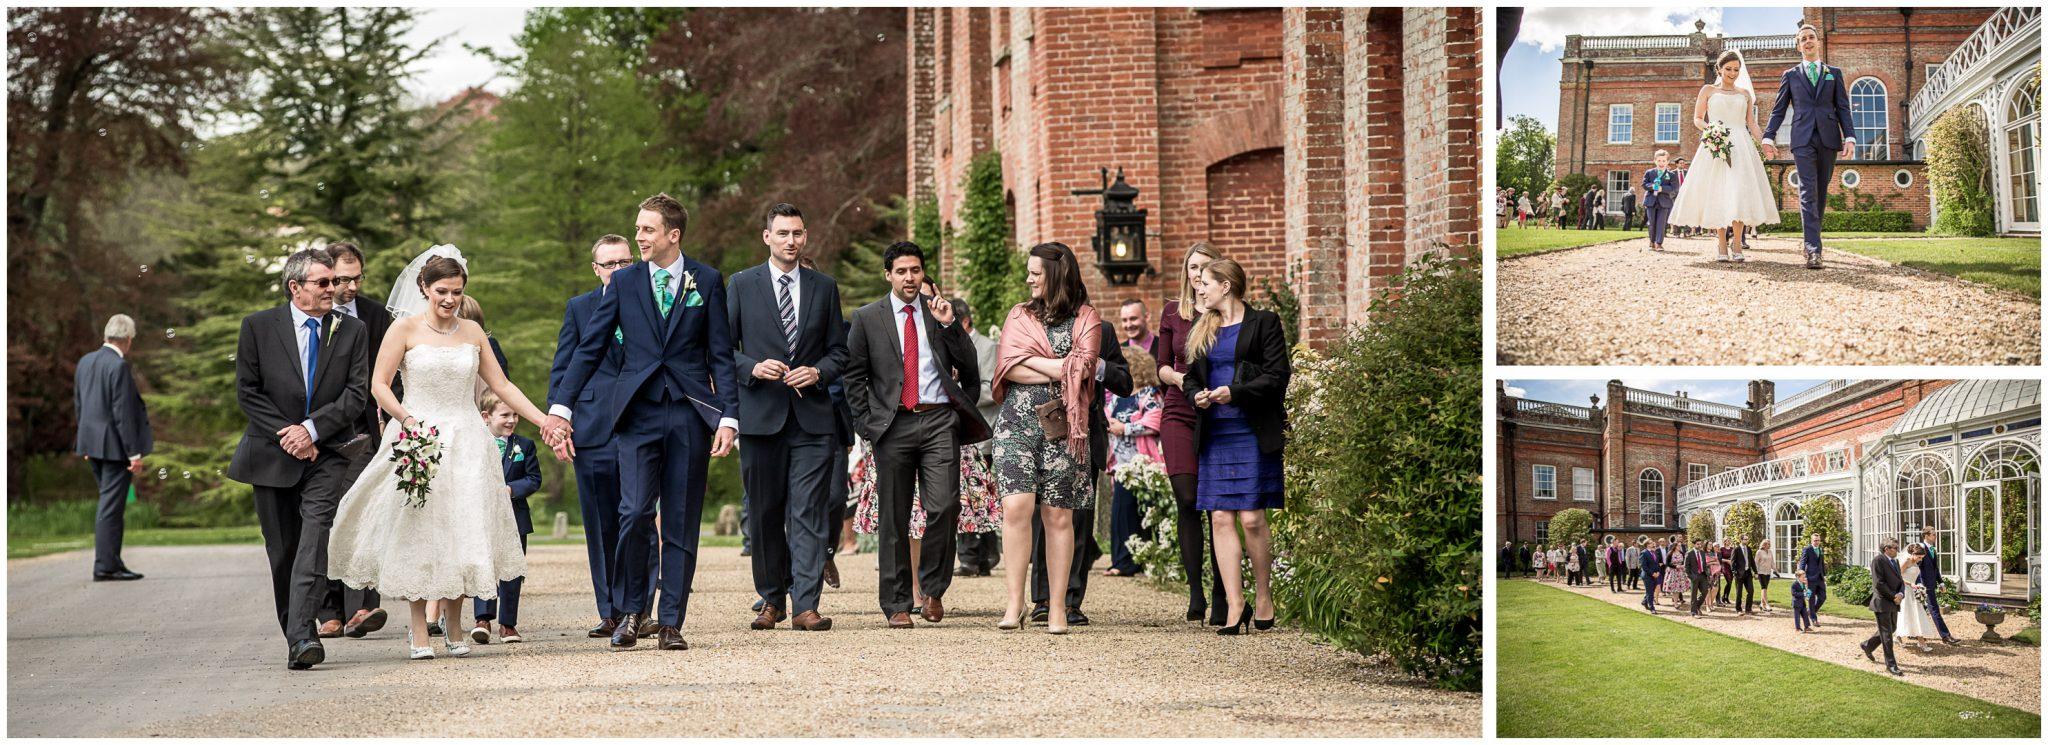 Avington Park wedding photography couple heading to reception